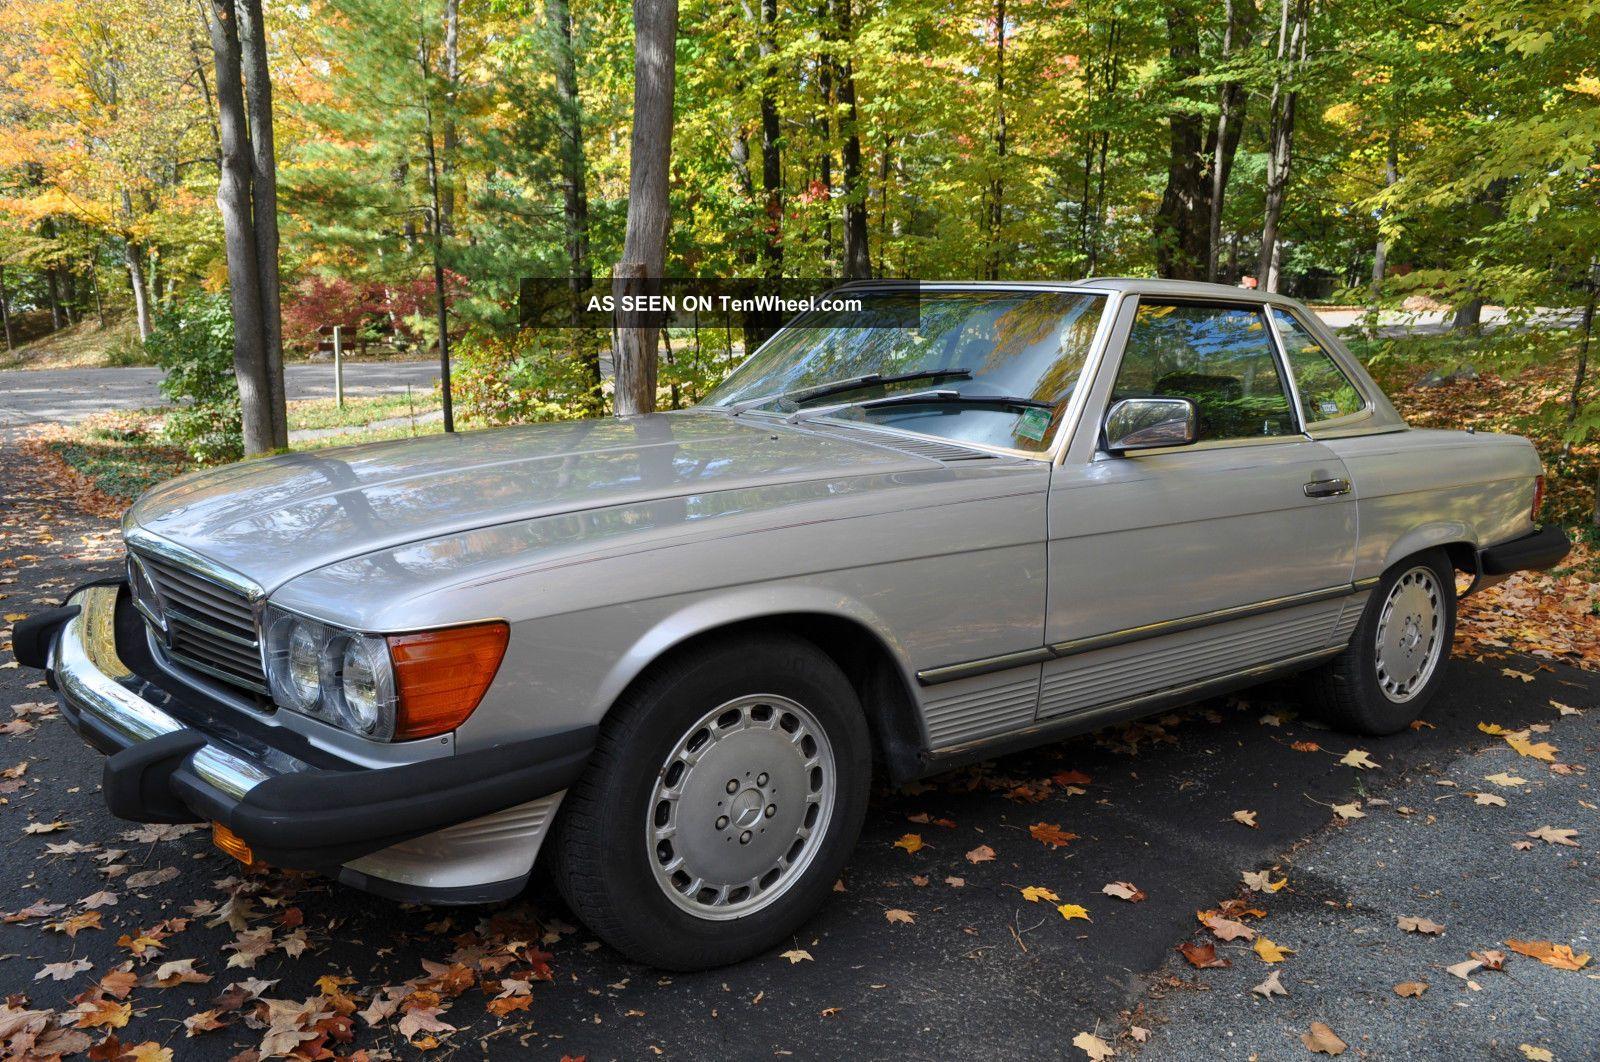 Classic Mercedes Benz 560sl Convertible - 1987 500-Series photo